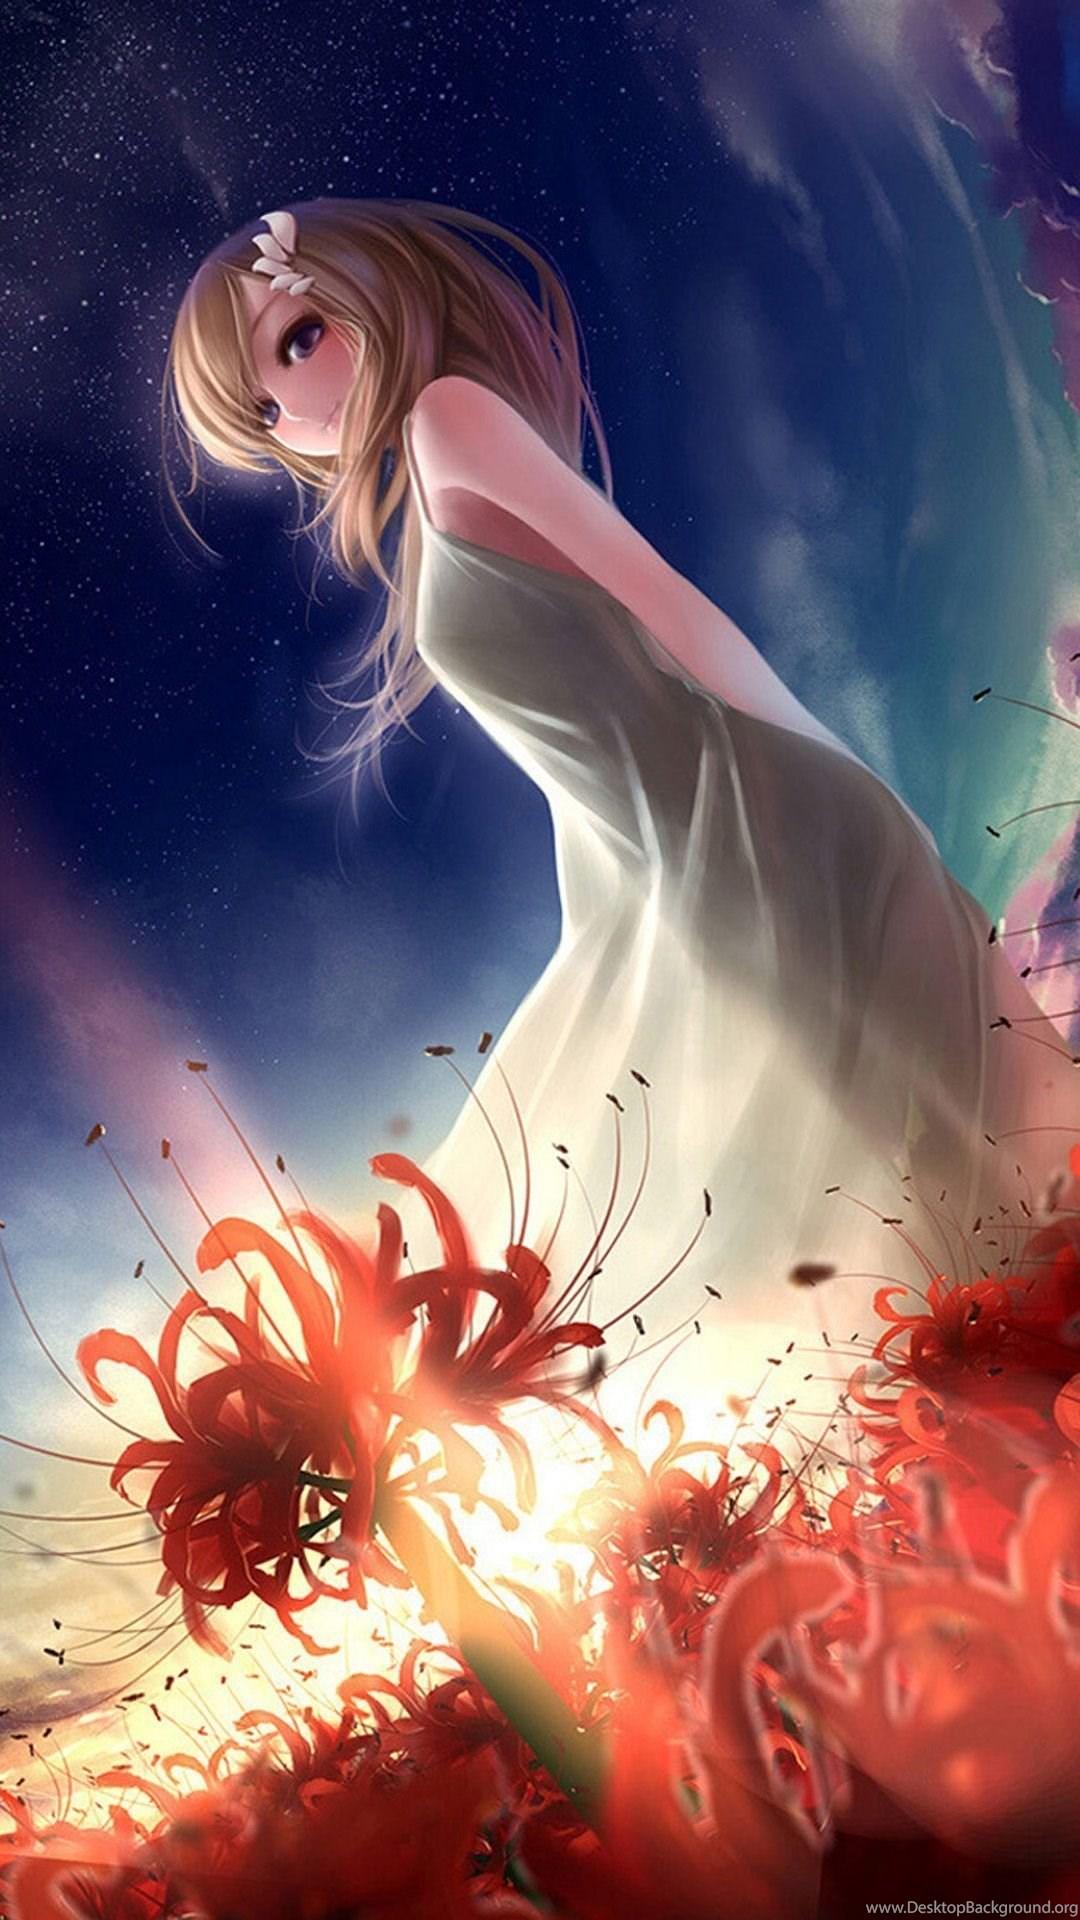 Android Animated Wallpaper 1080x1920 Girls Anime Desktop